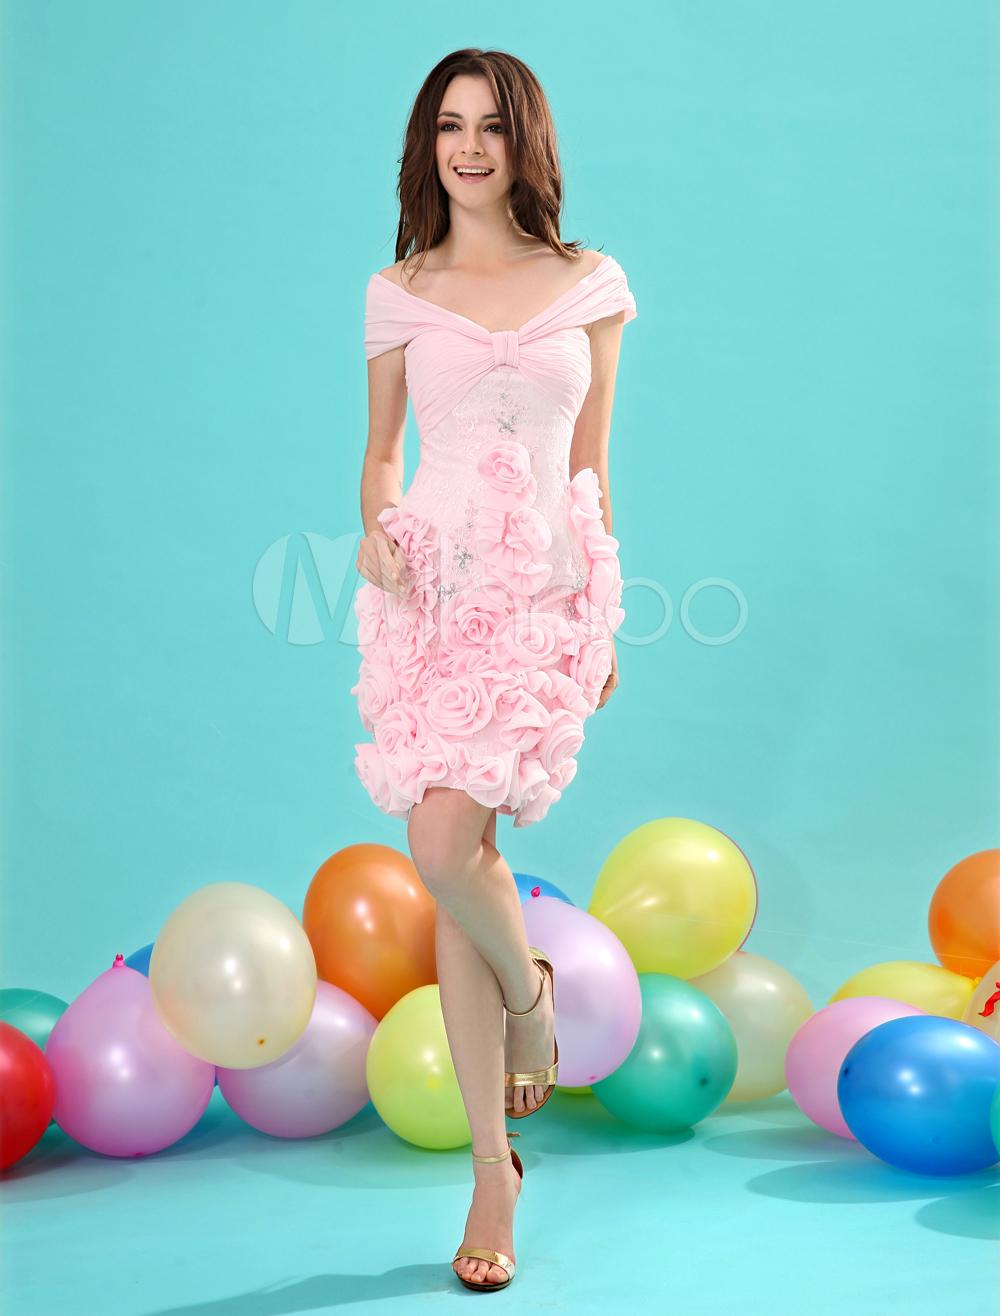 Off-The-Shoulder Flower Chiffon Pink Short A-line Cocktail Dress Milanoo